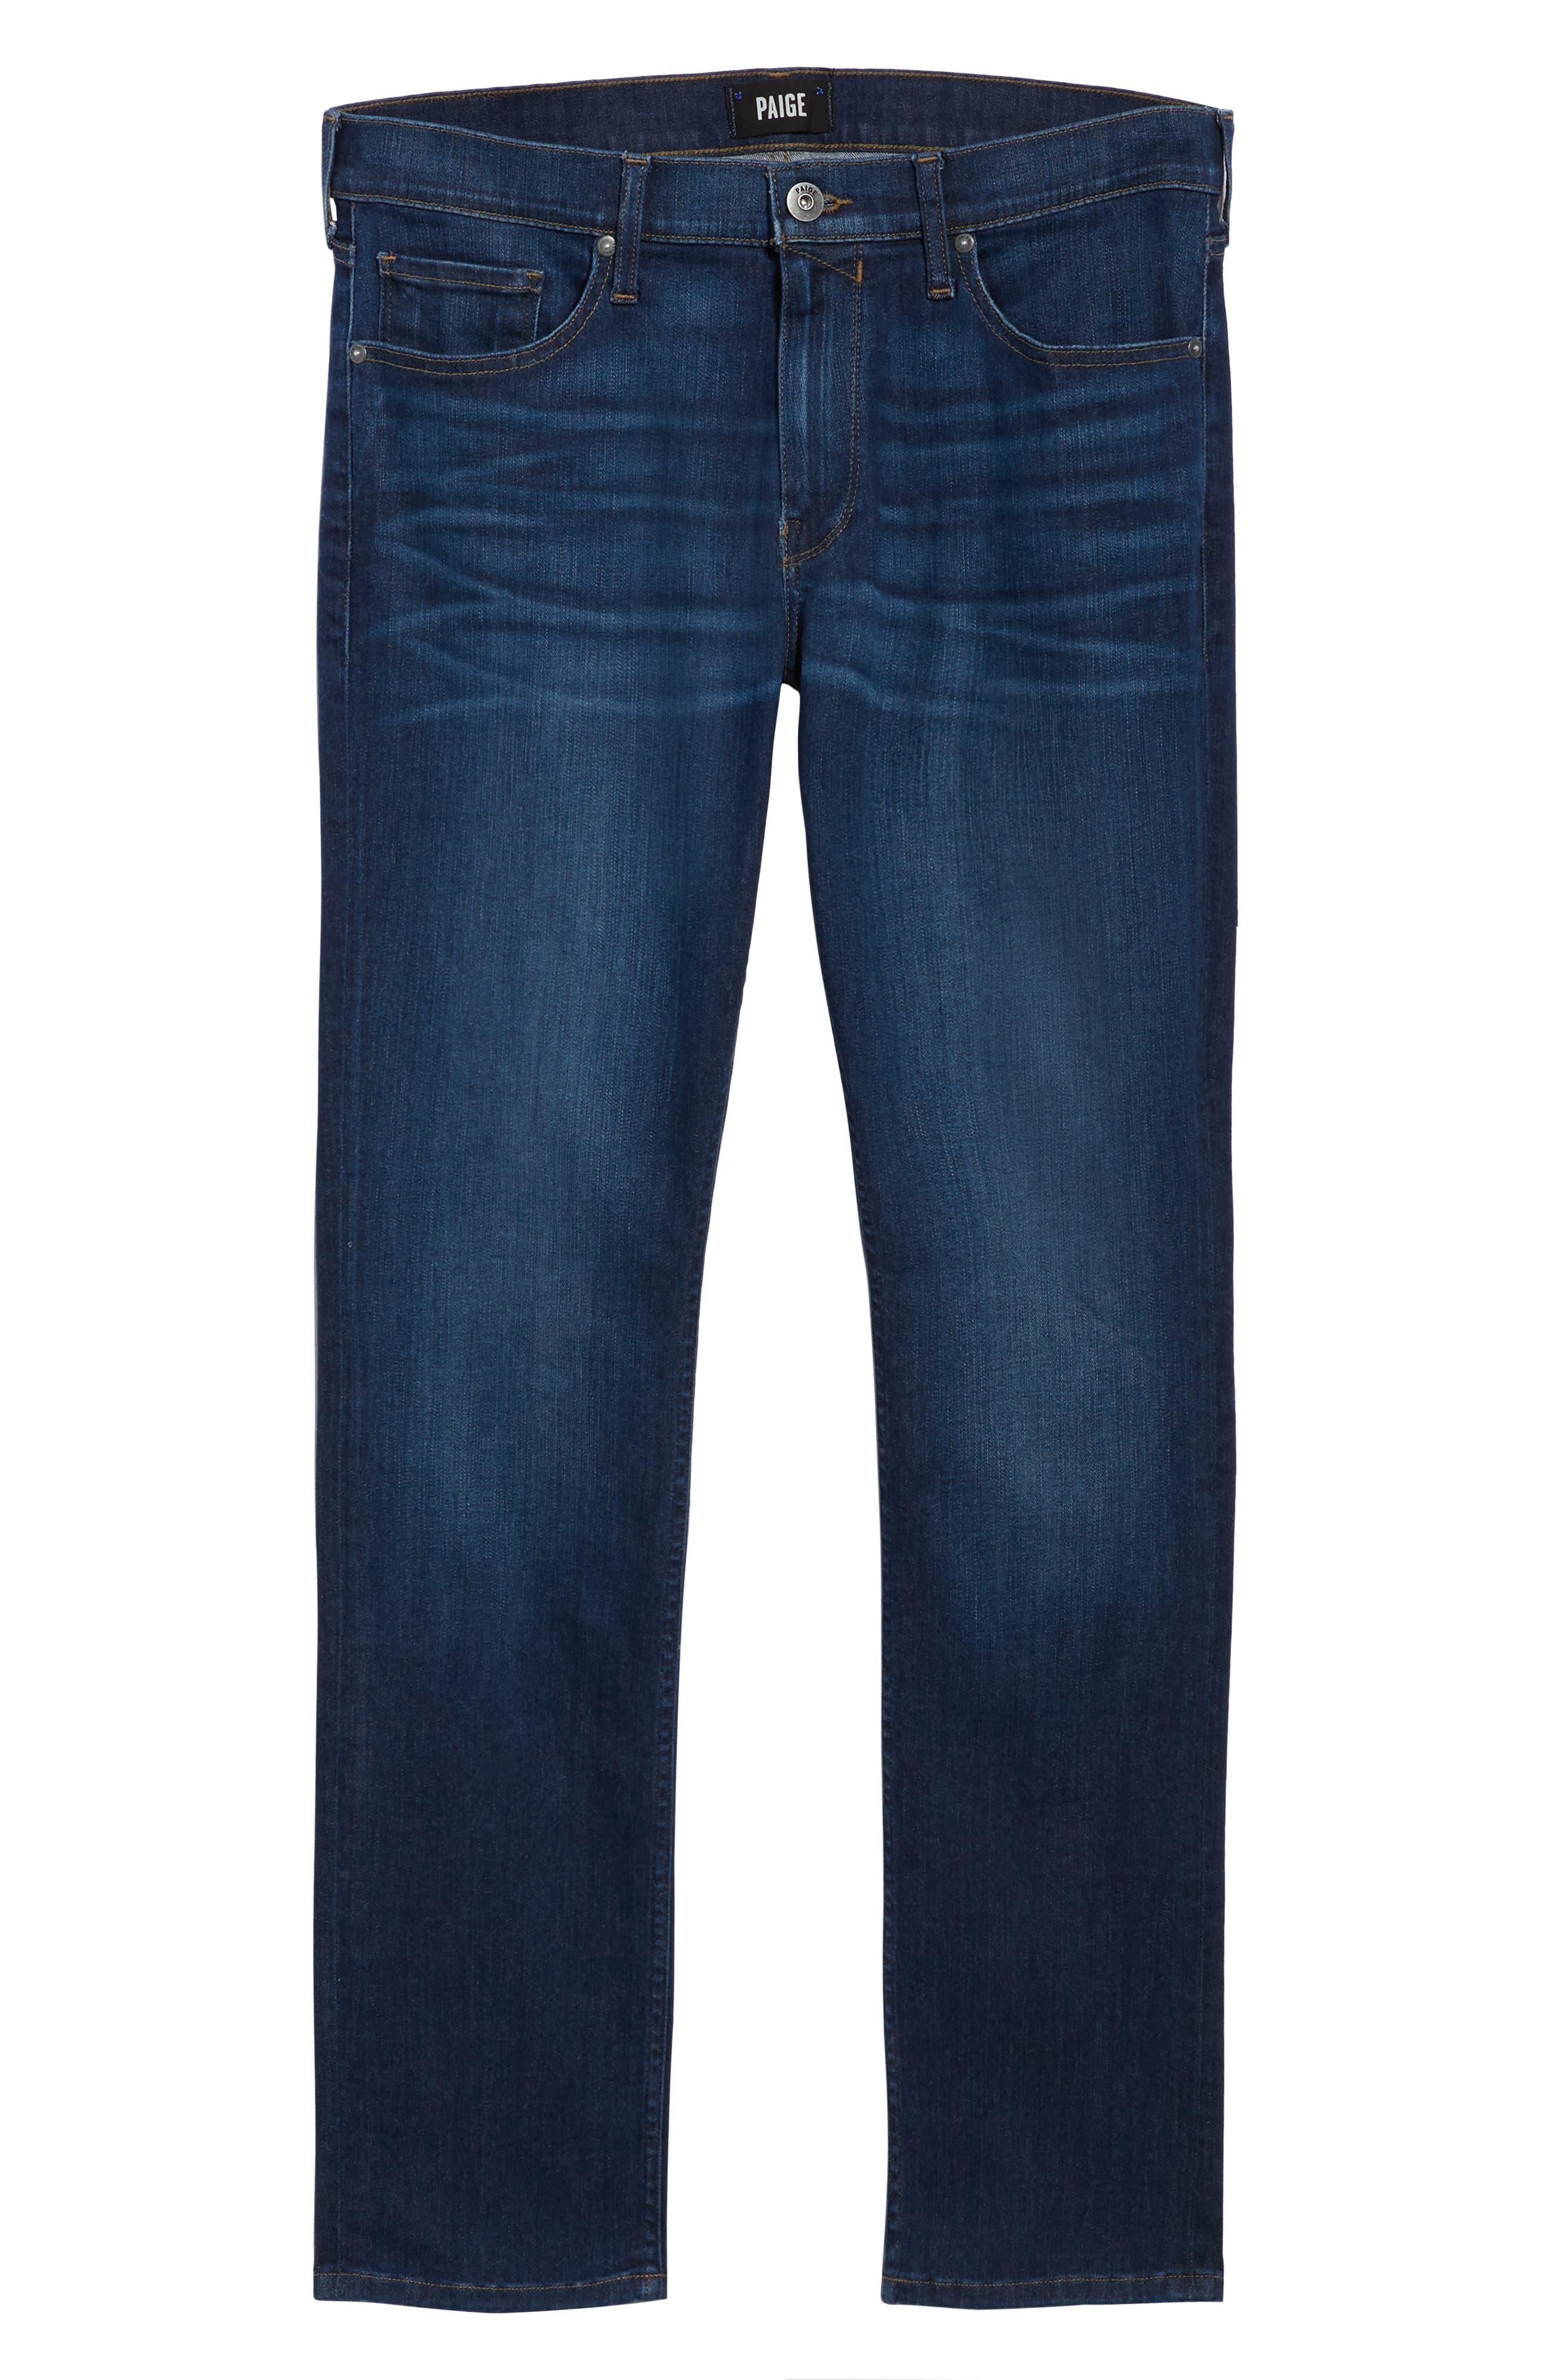 Transcend Vintage - Federal Slim Straight Leg Jeans,                             Alternate thumbnail 6, color,                             ELWYN